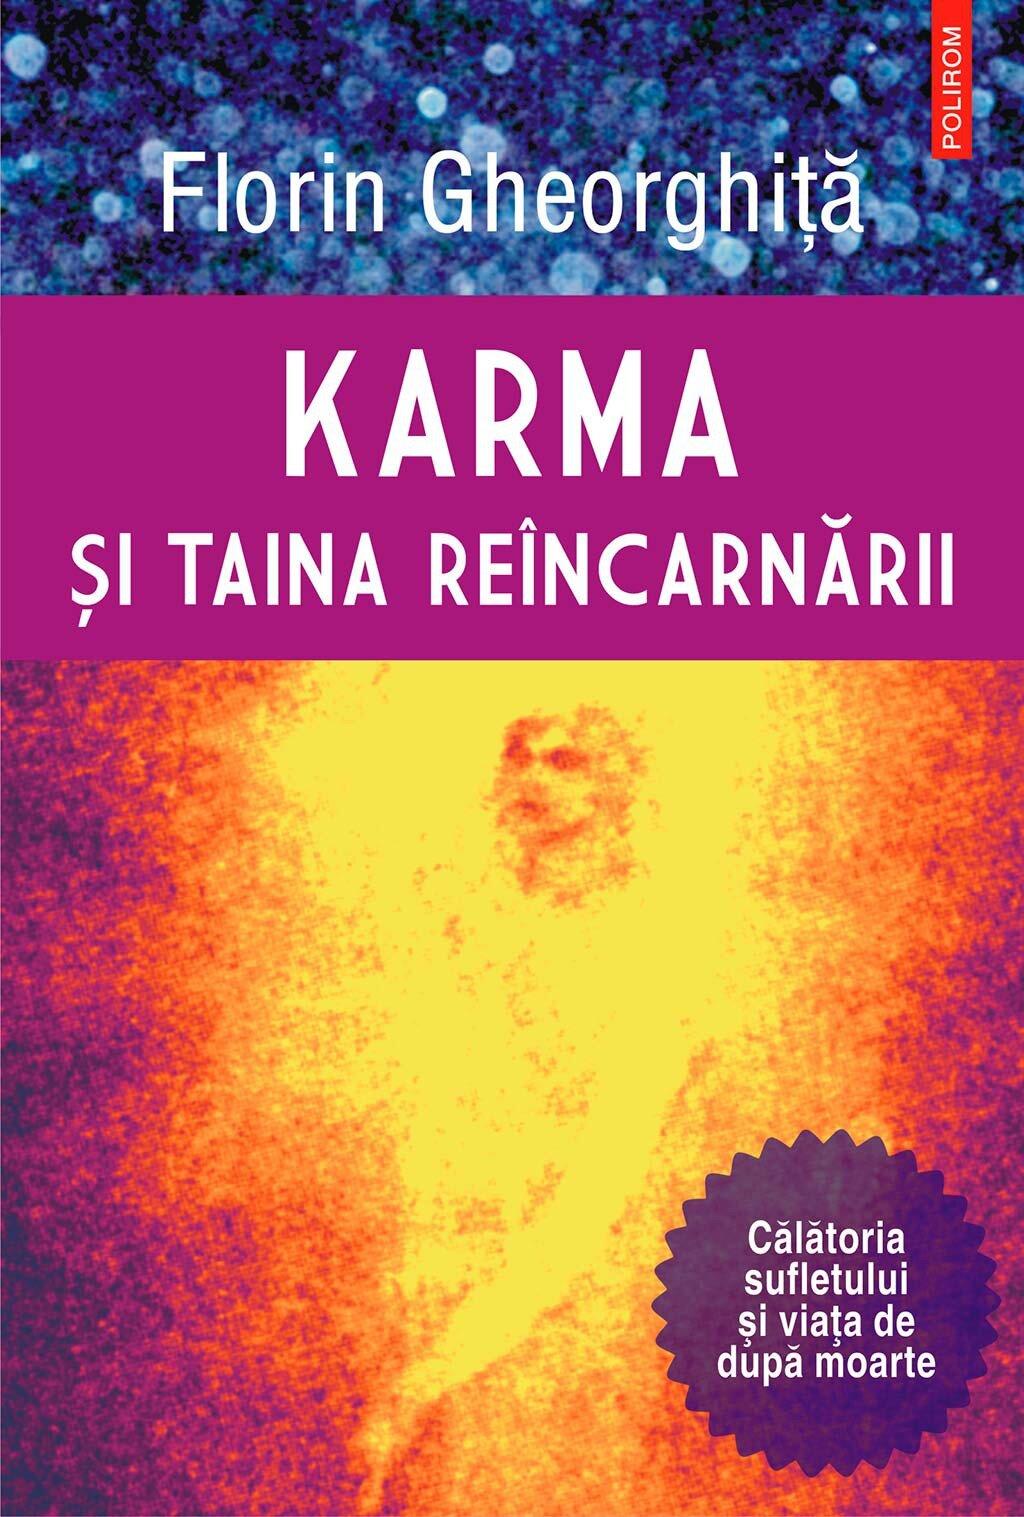 Karma si taina reincarnarii (eBook)